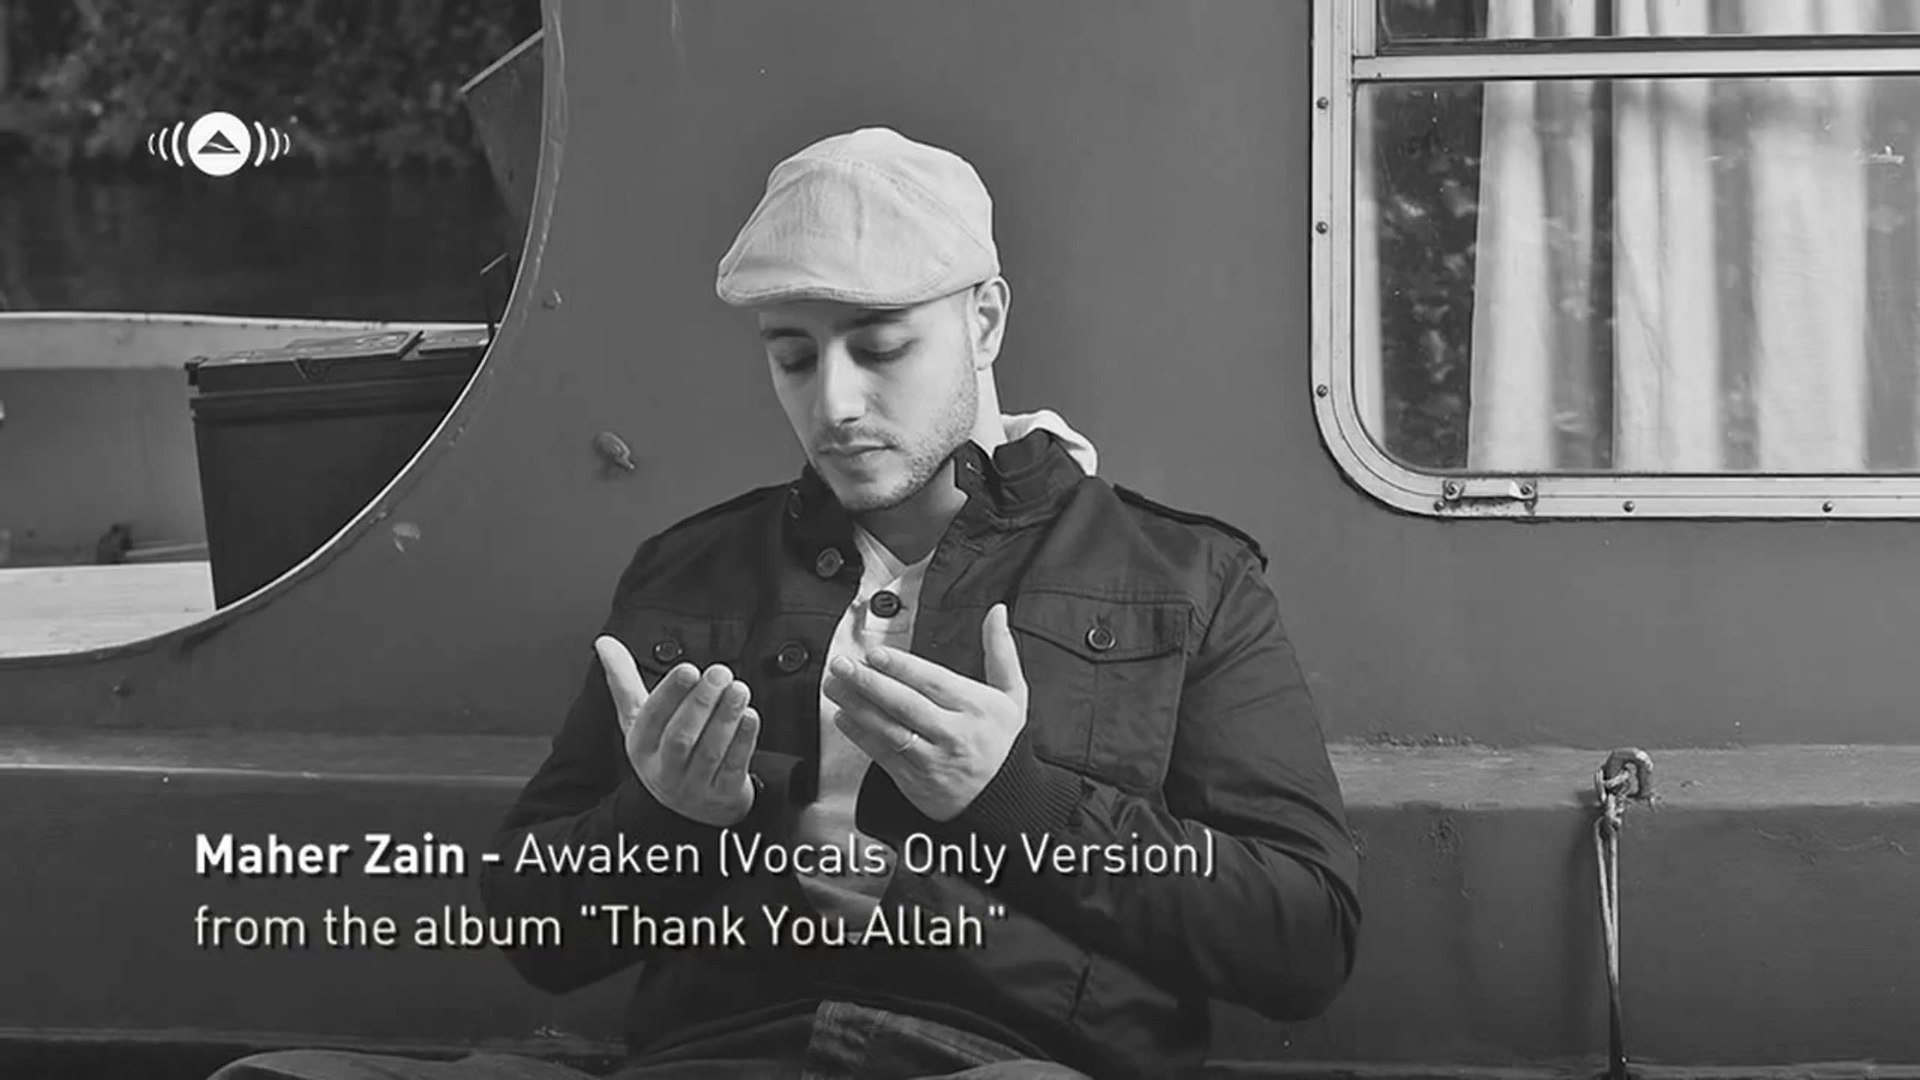 Maher Zain - Awaken   Vocals Only (Lyrics)